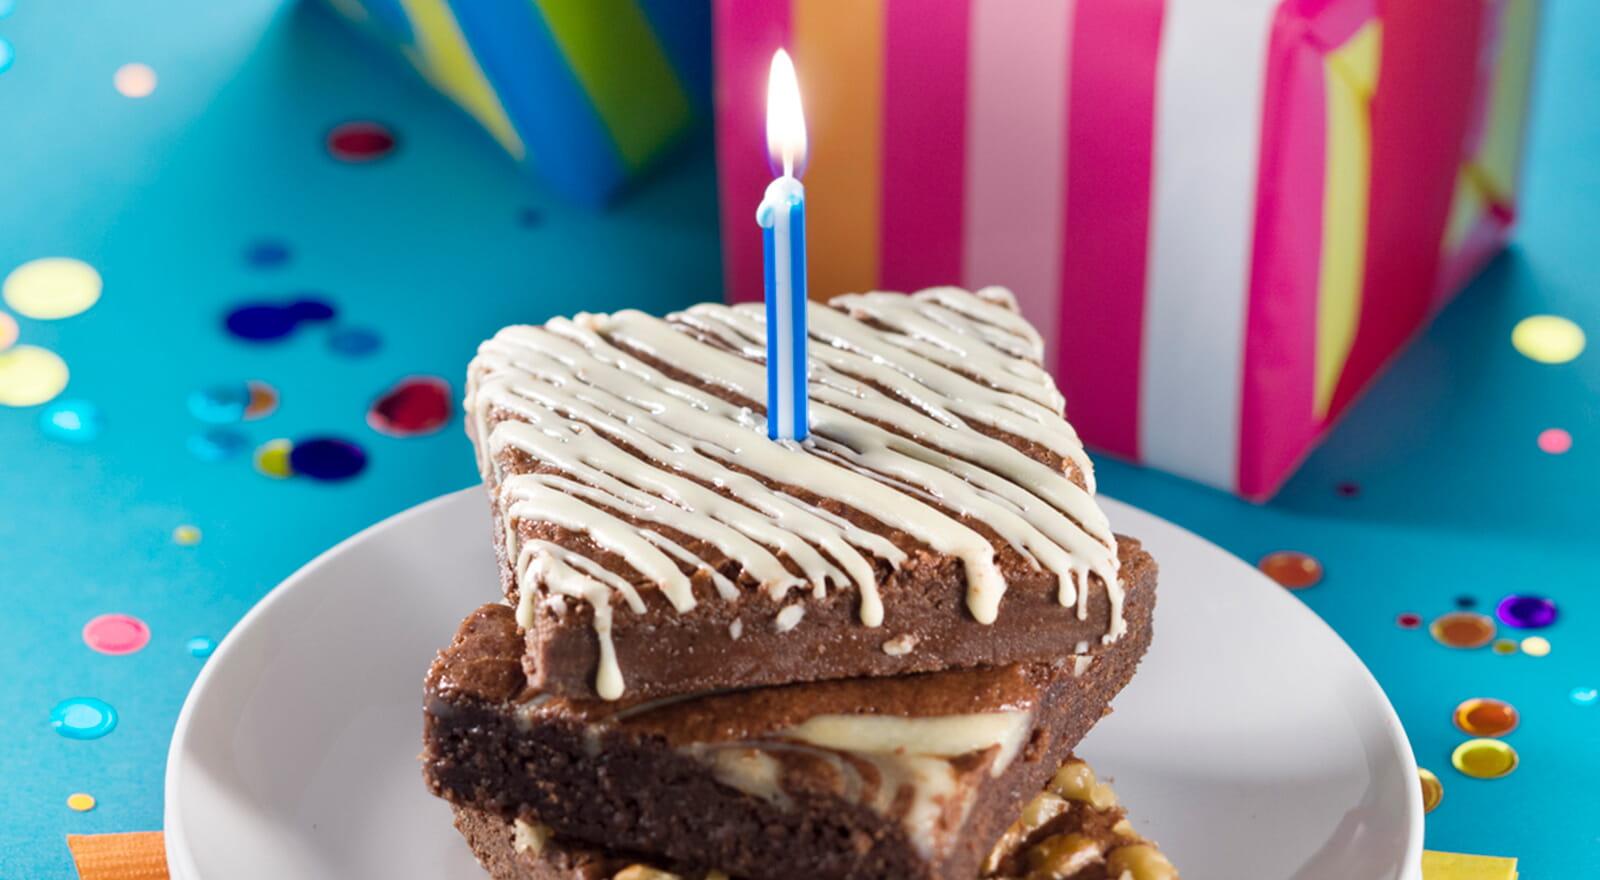 Send some birthday brownies